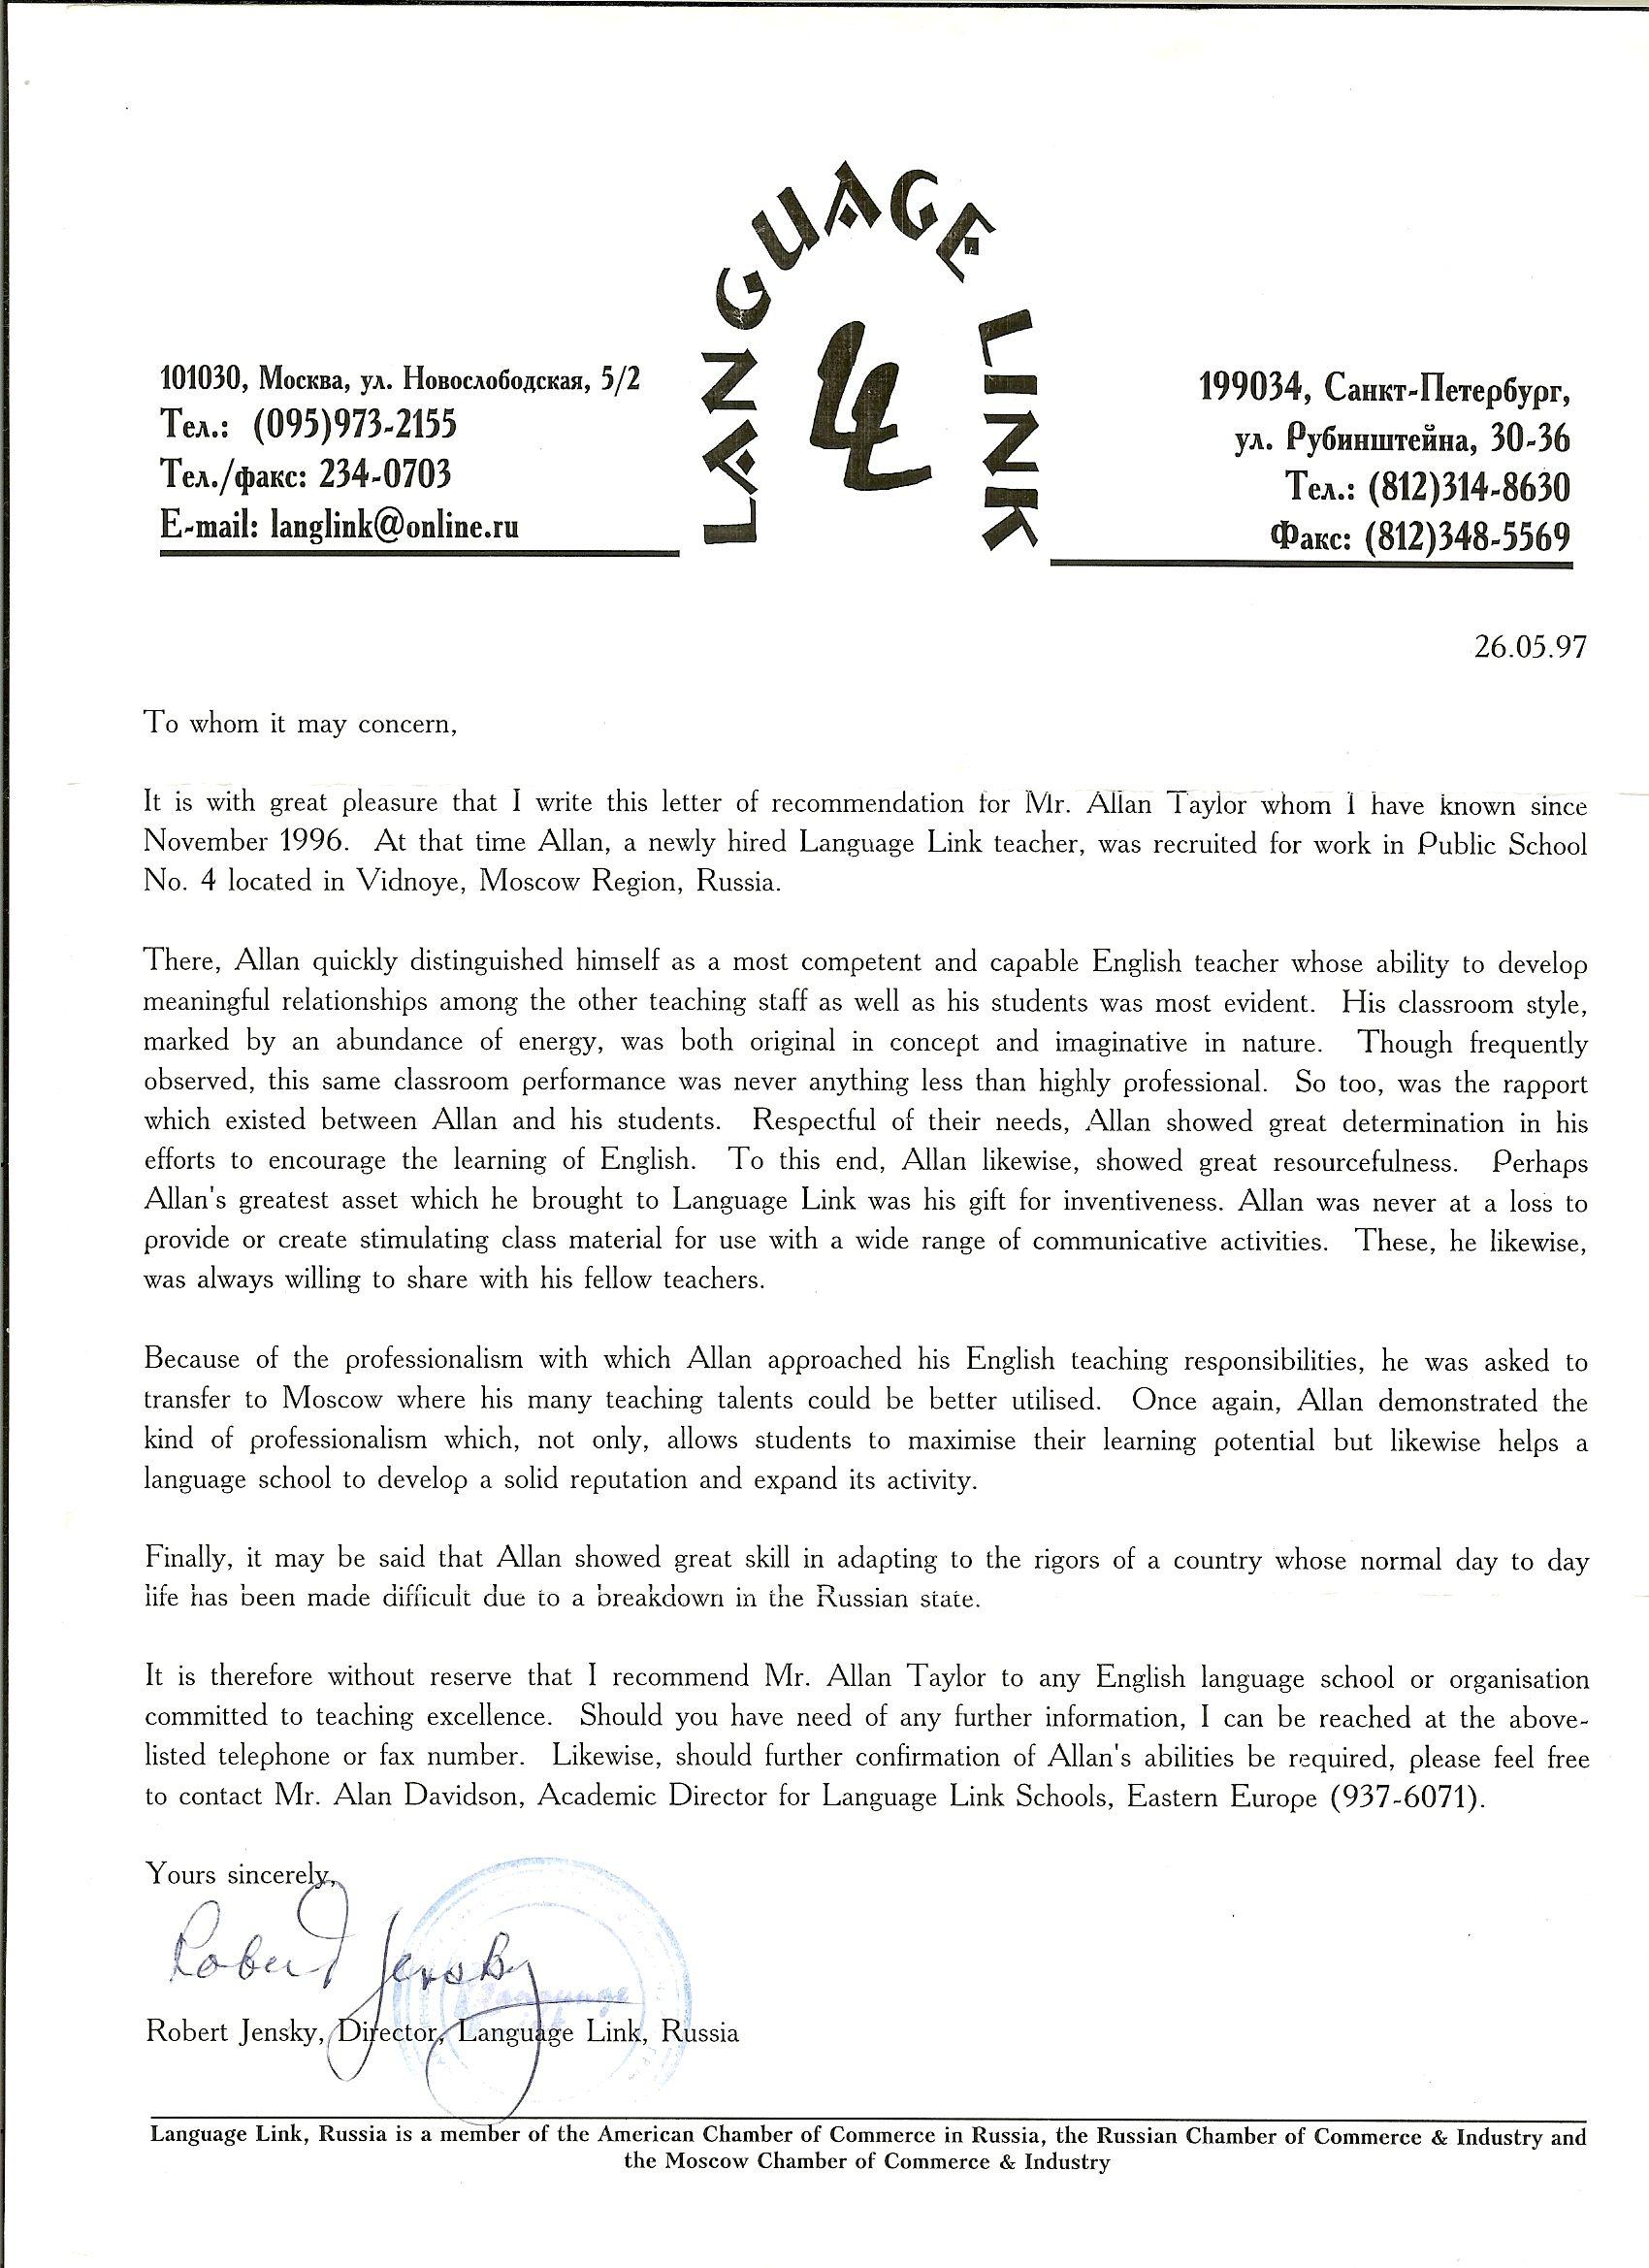 Recommendation letter sample for student elementary httpwww recommendation letter sample for student elementary httpresumecareerfo spiritdancerdesigns Image collections